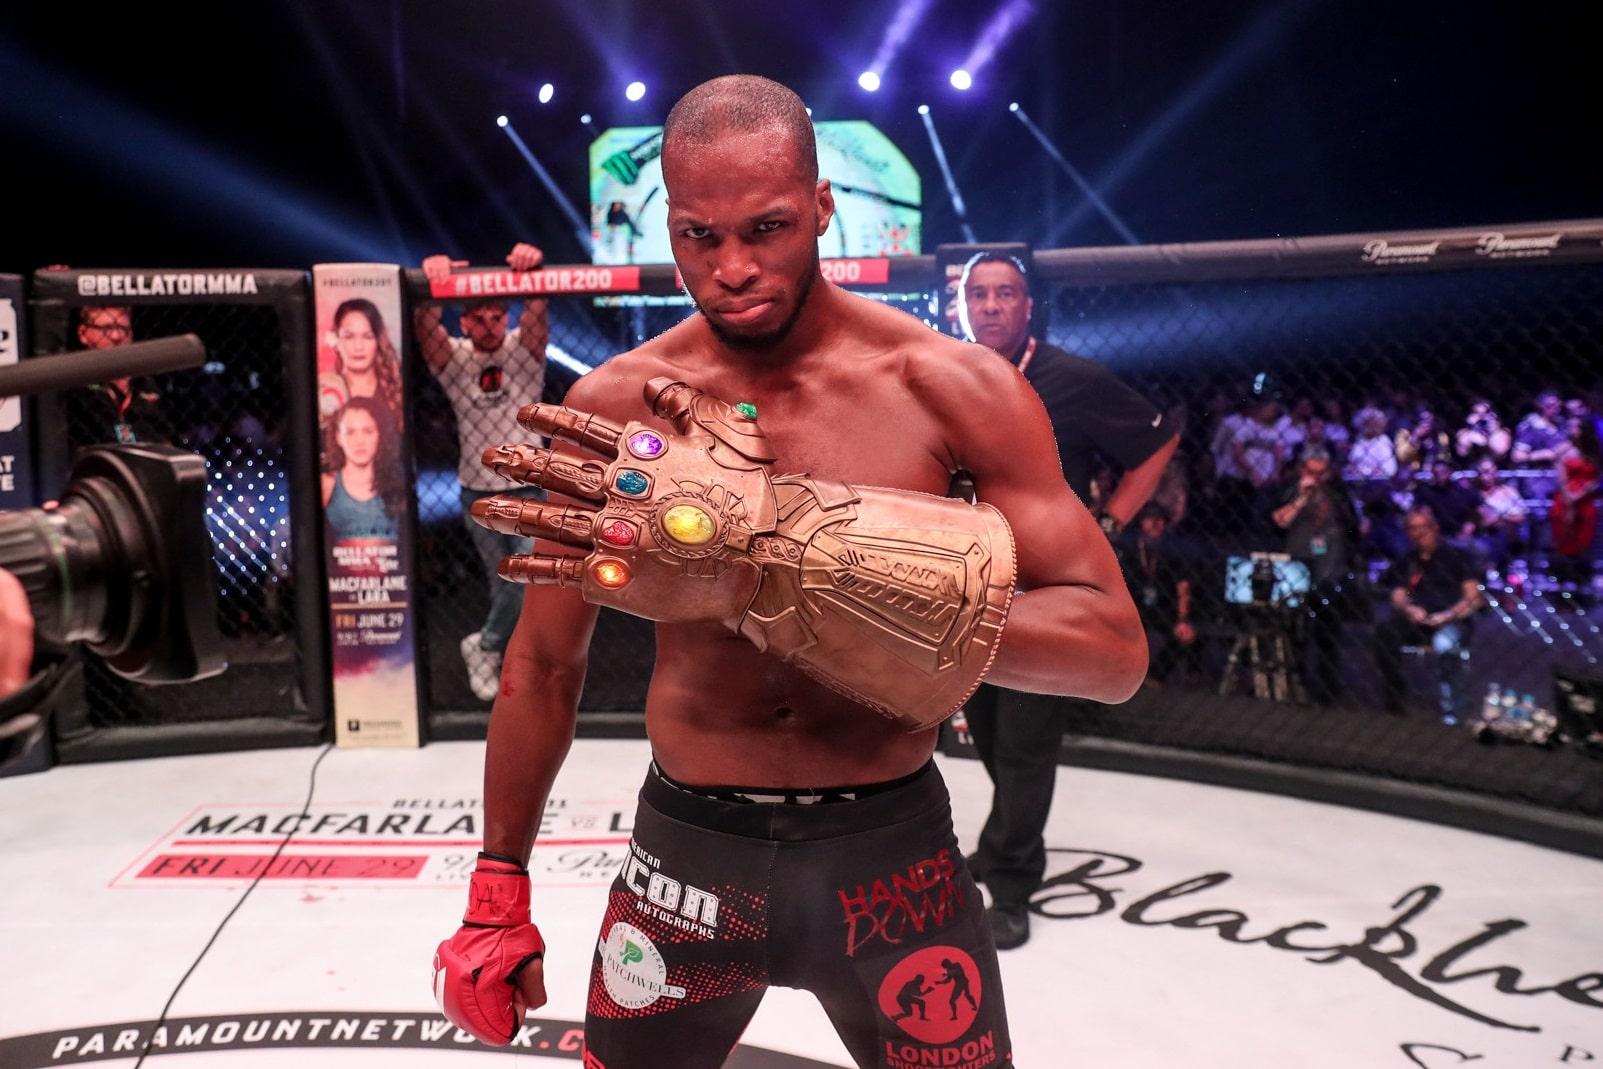 Майкл Пейдж - боец Bellator: биография, статистика, видео лучших боёв